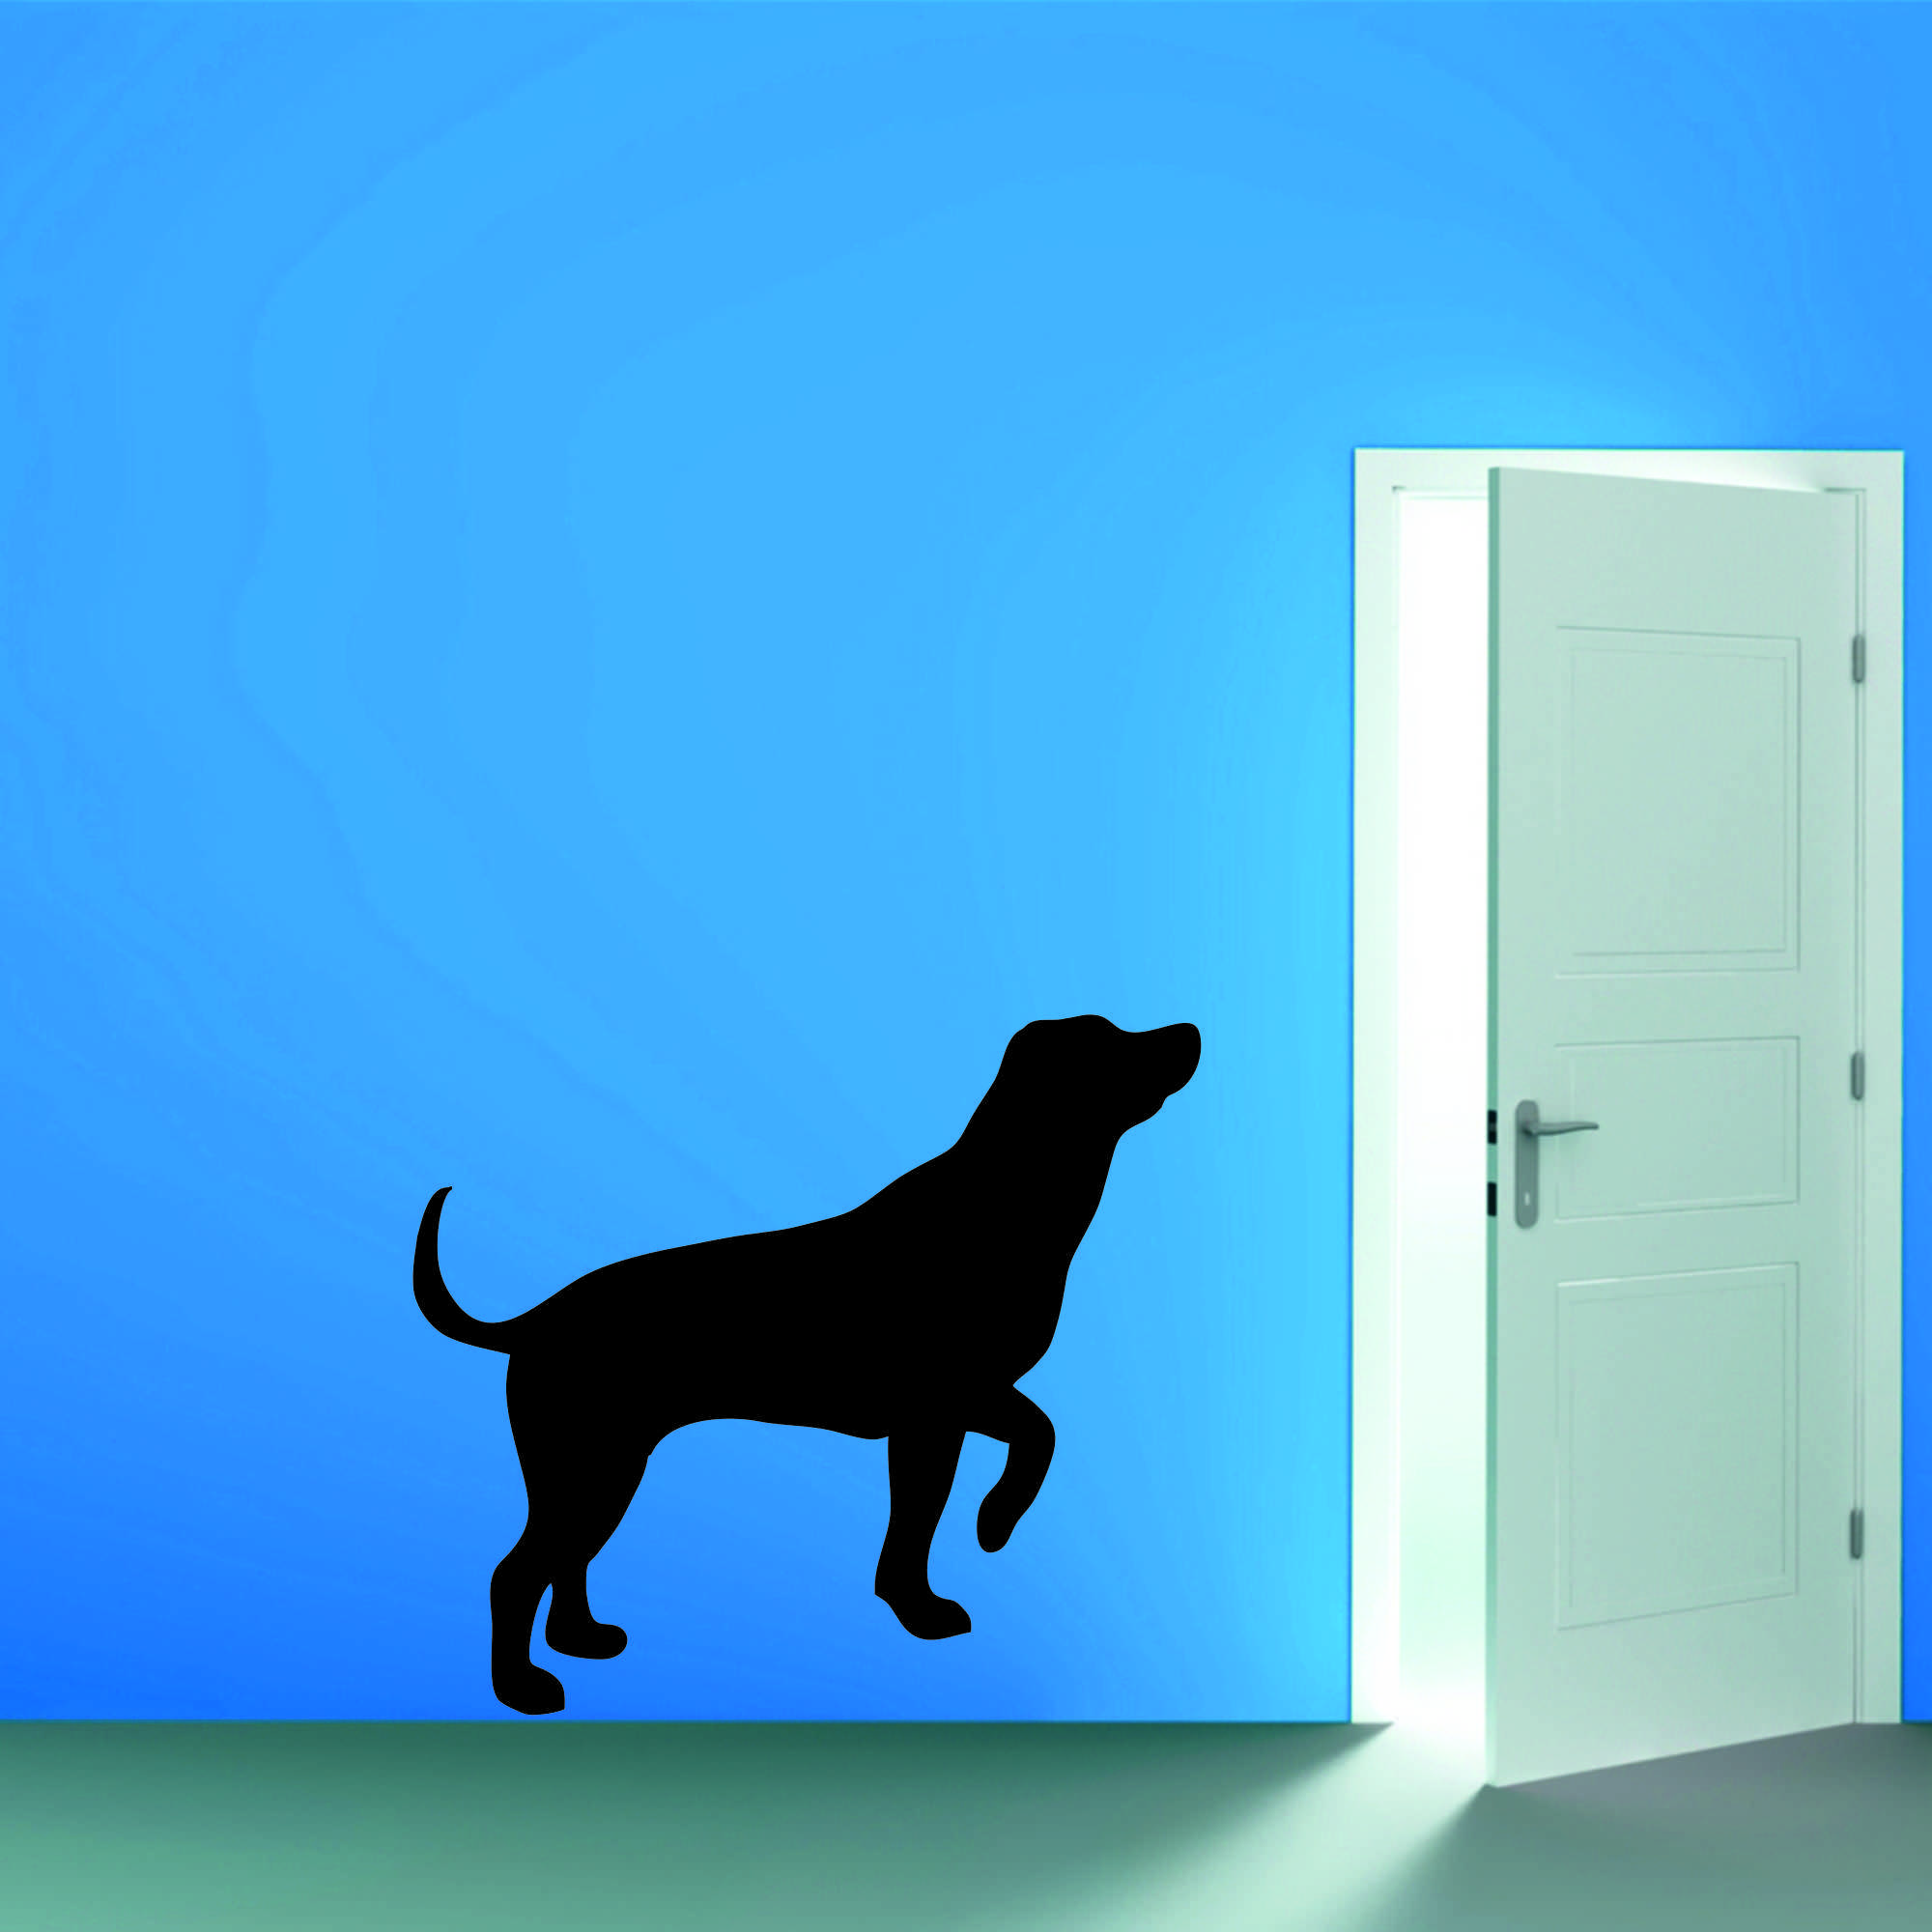 Samolepka na zeď - Silueta psa 2 - 60x53 cm - PopyDesign